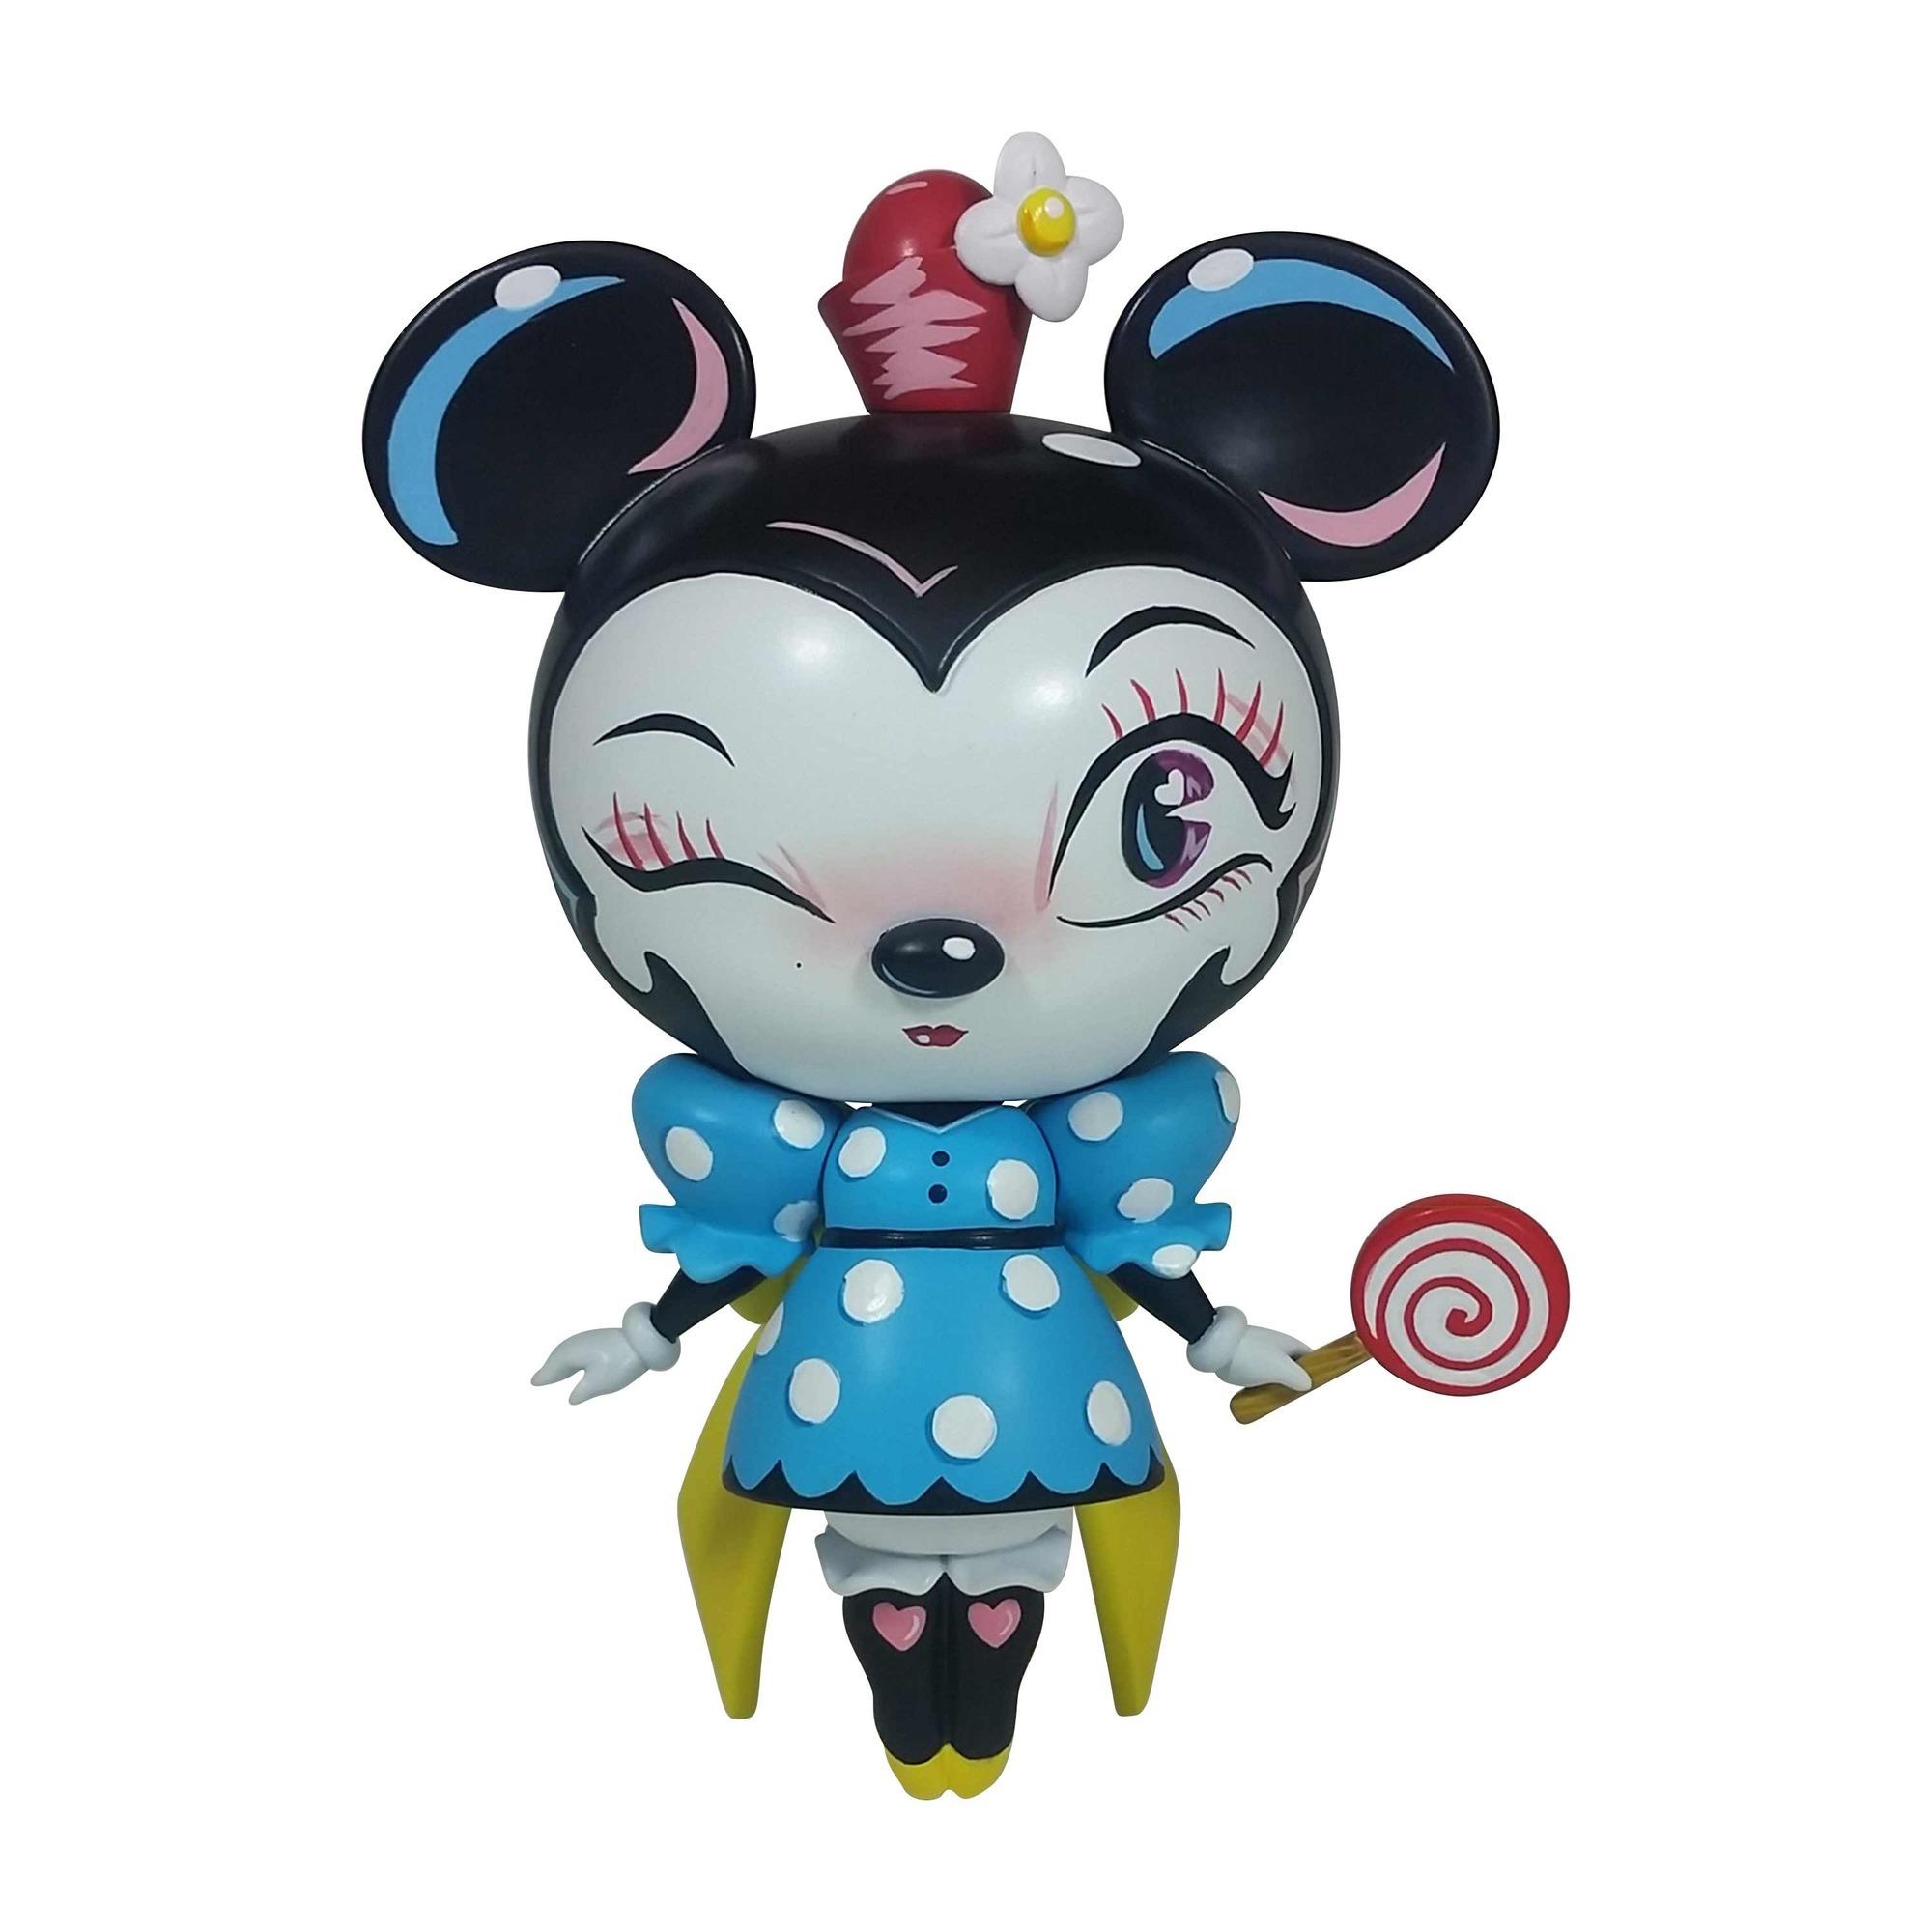 World of Miss Mindy 6001676N Vinyl - Minnie Mouse